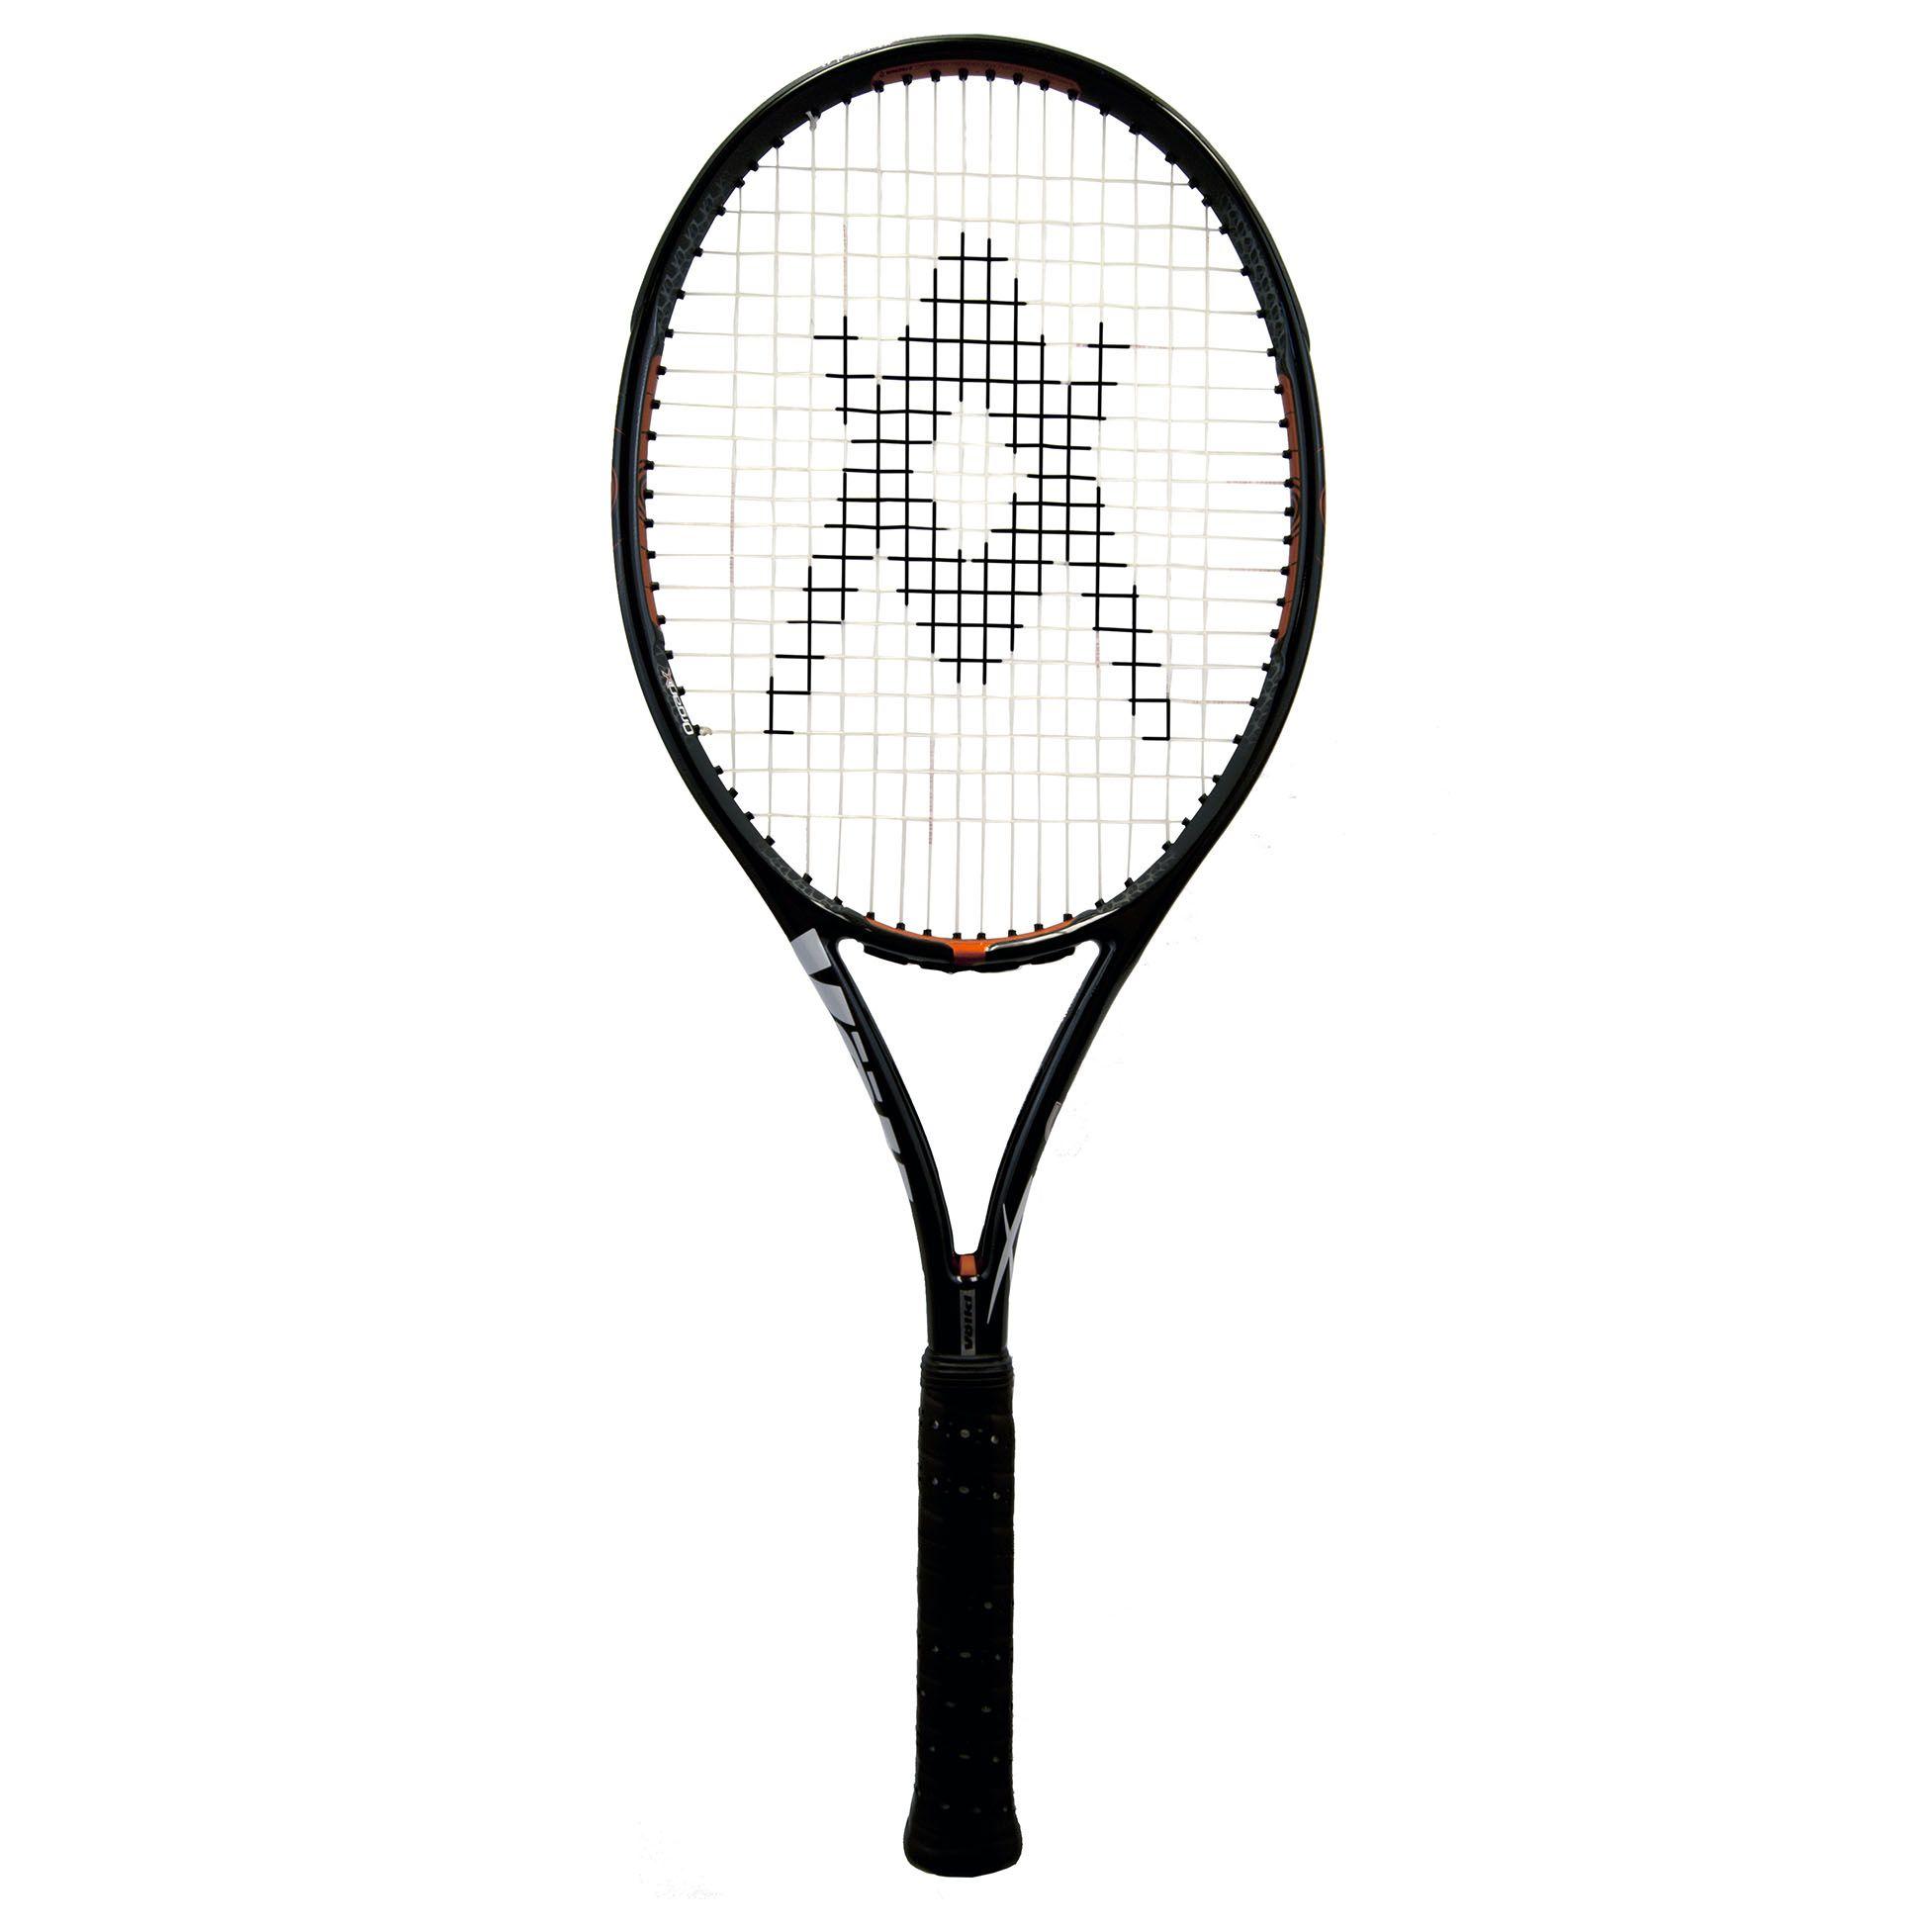 Volkl Organix 9 Tennis Racket Sweatband Com